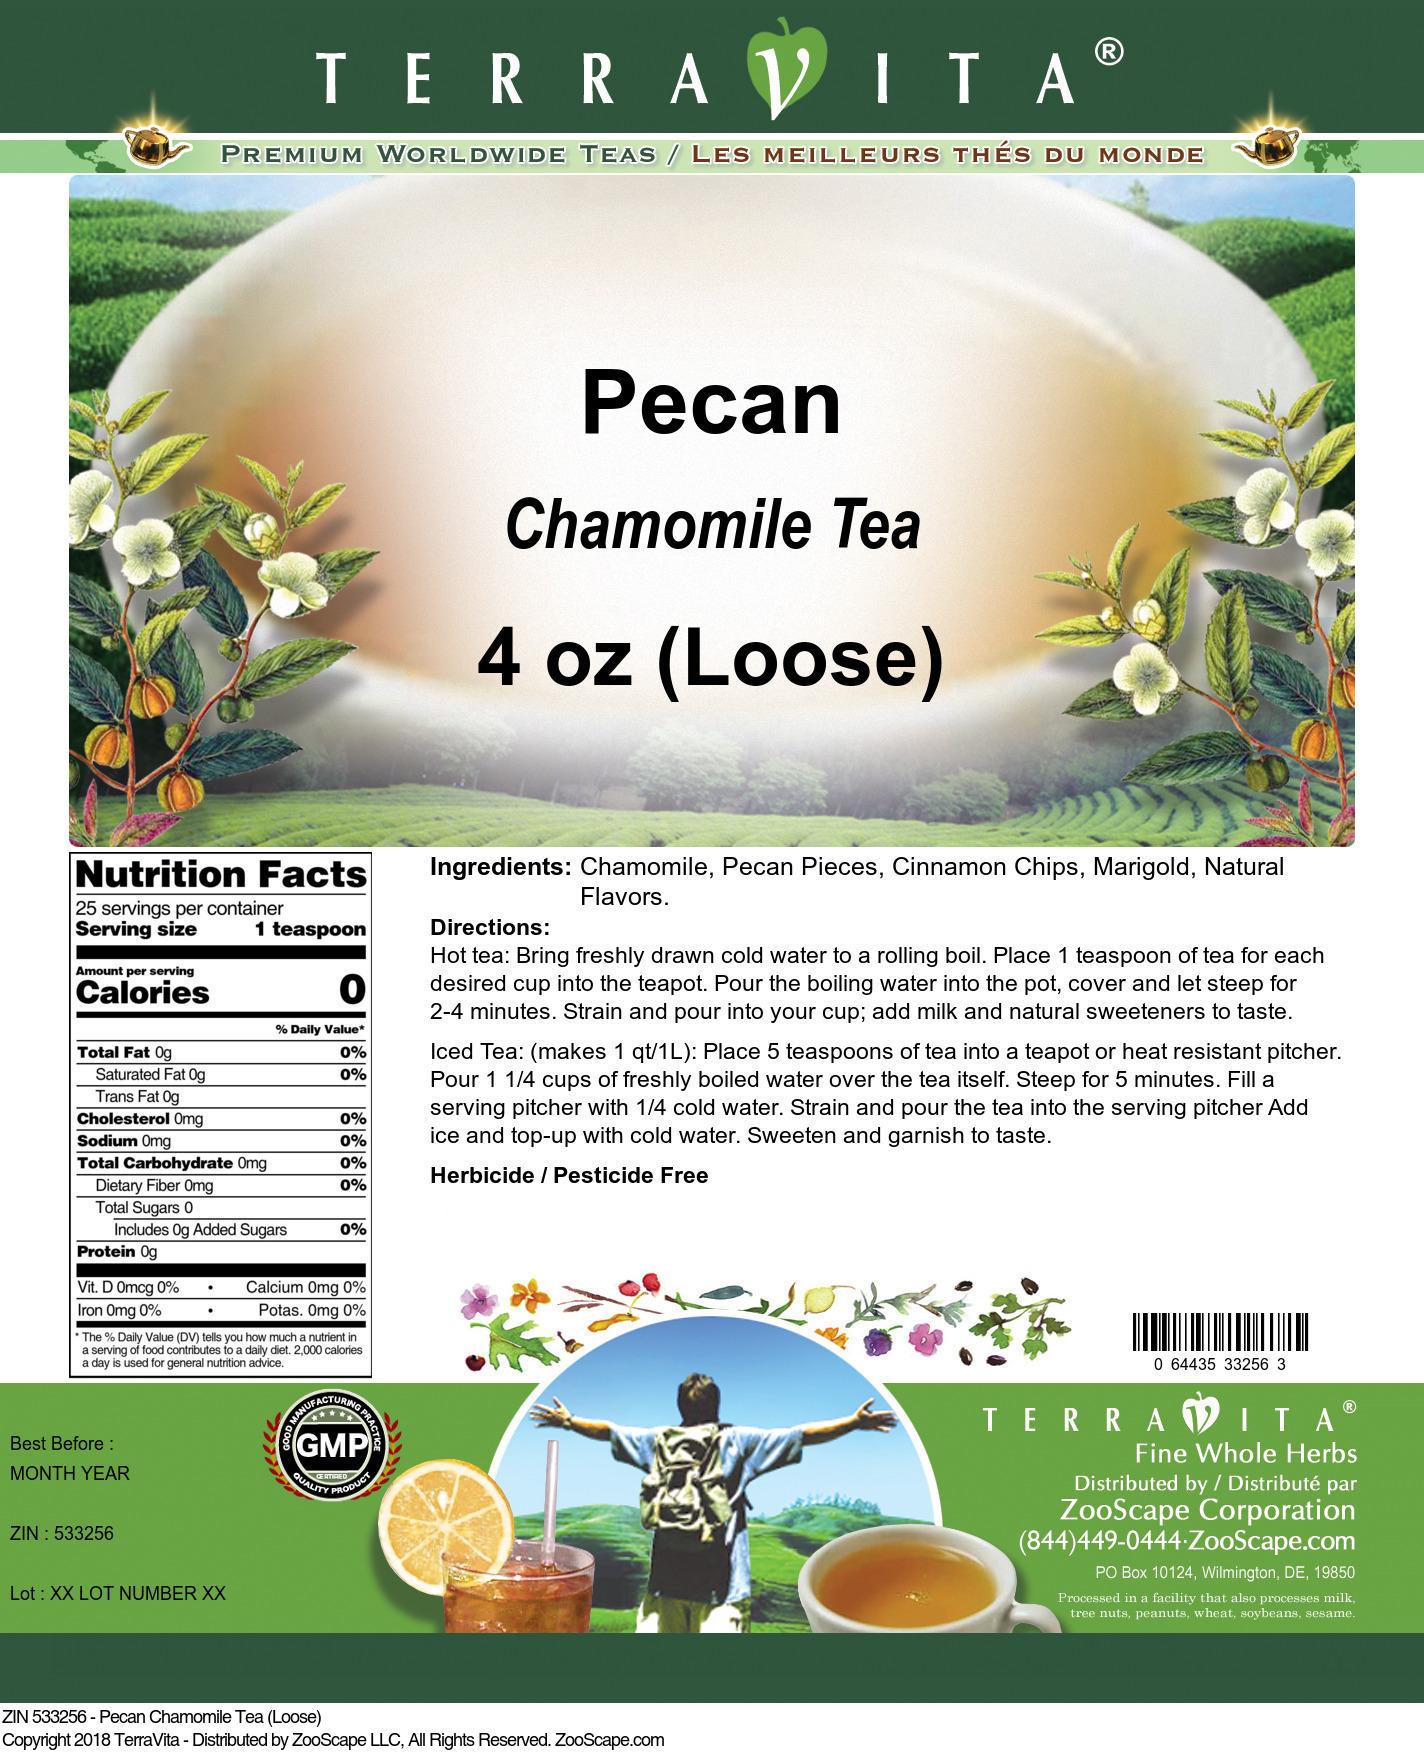 Pecan Chamomile Tea